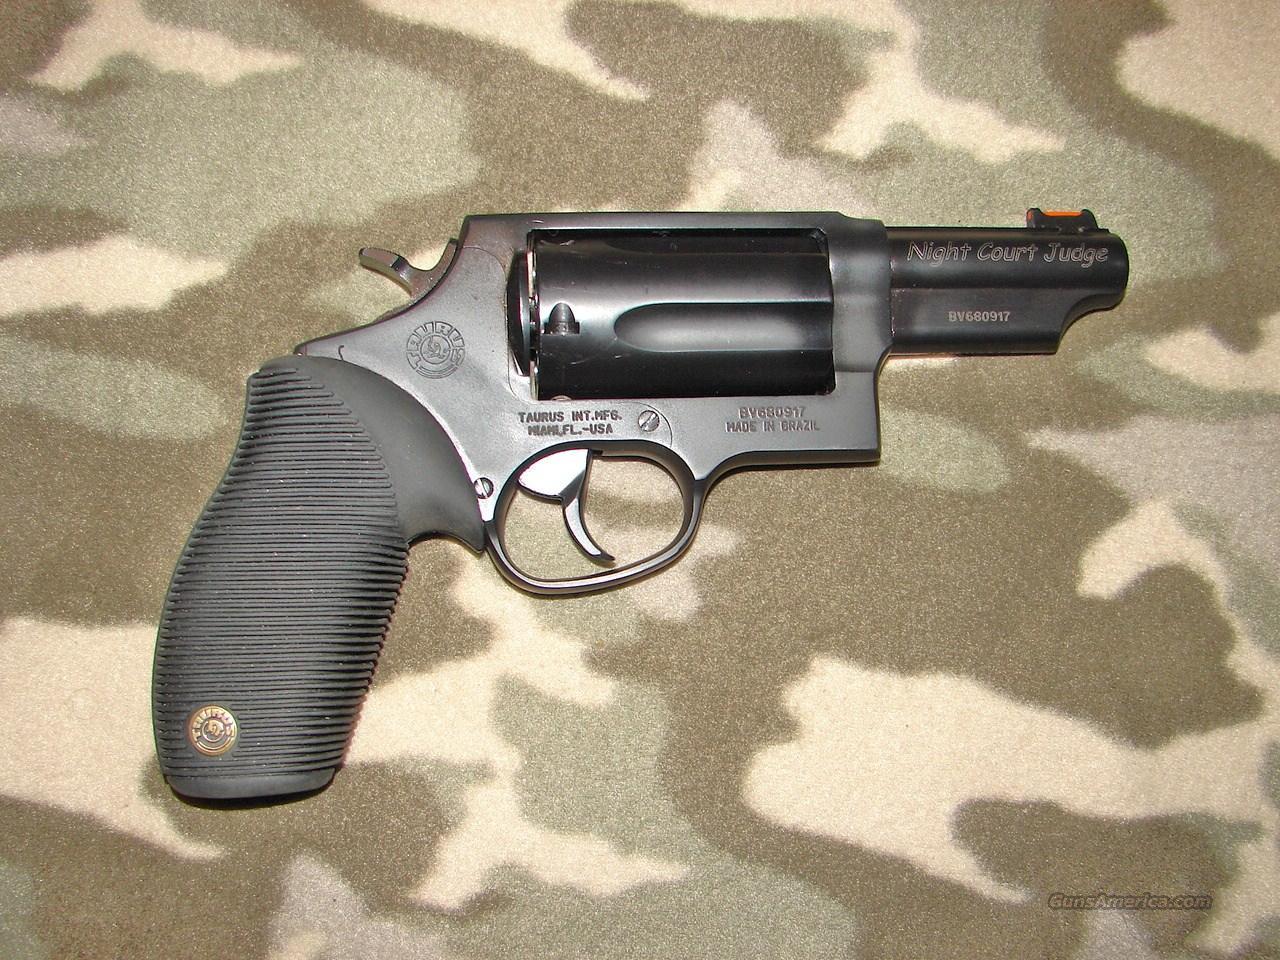 Taurus Model 4510 Night Court Judge  Guns > Pistols > Taurus Pistols > Revolvers